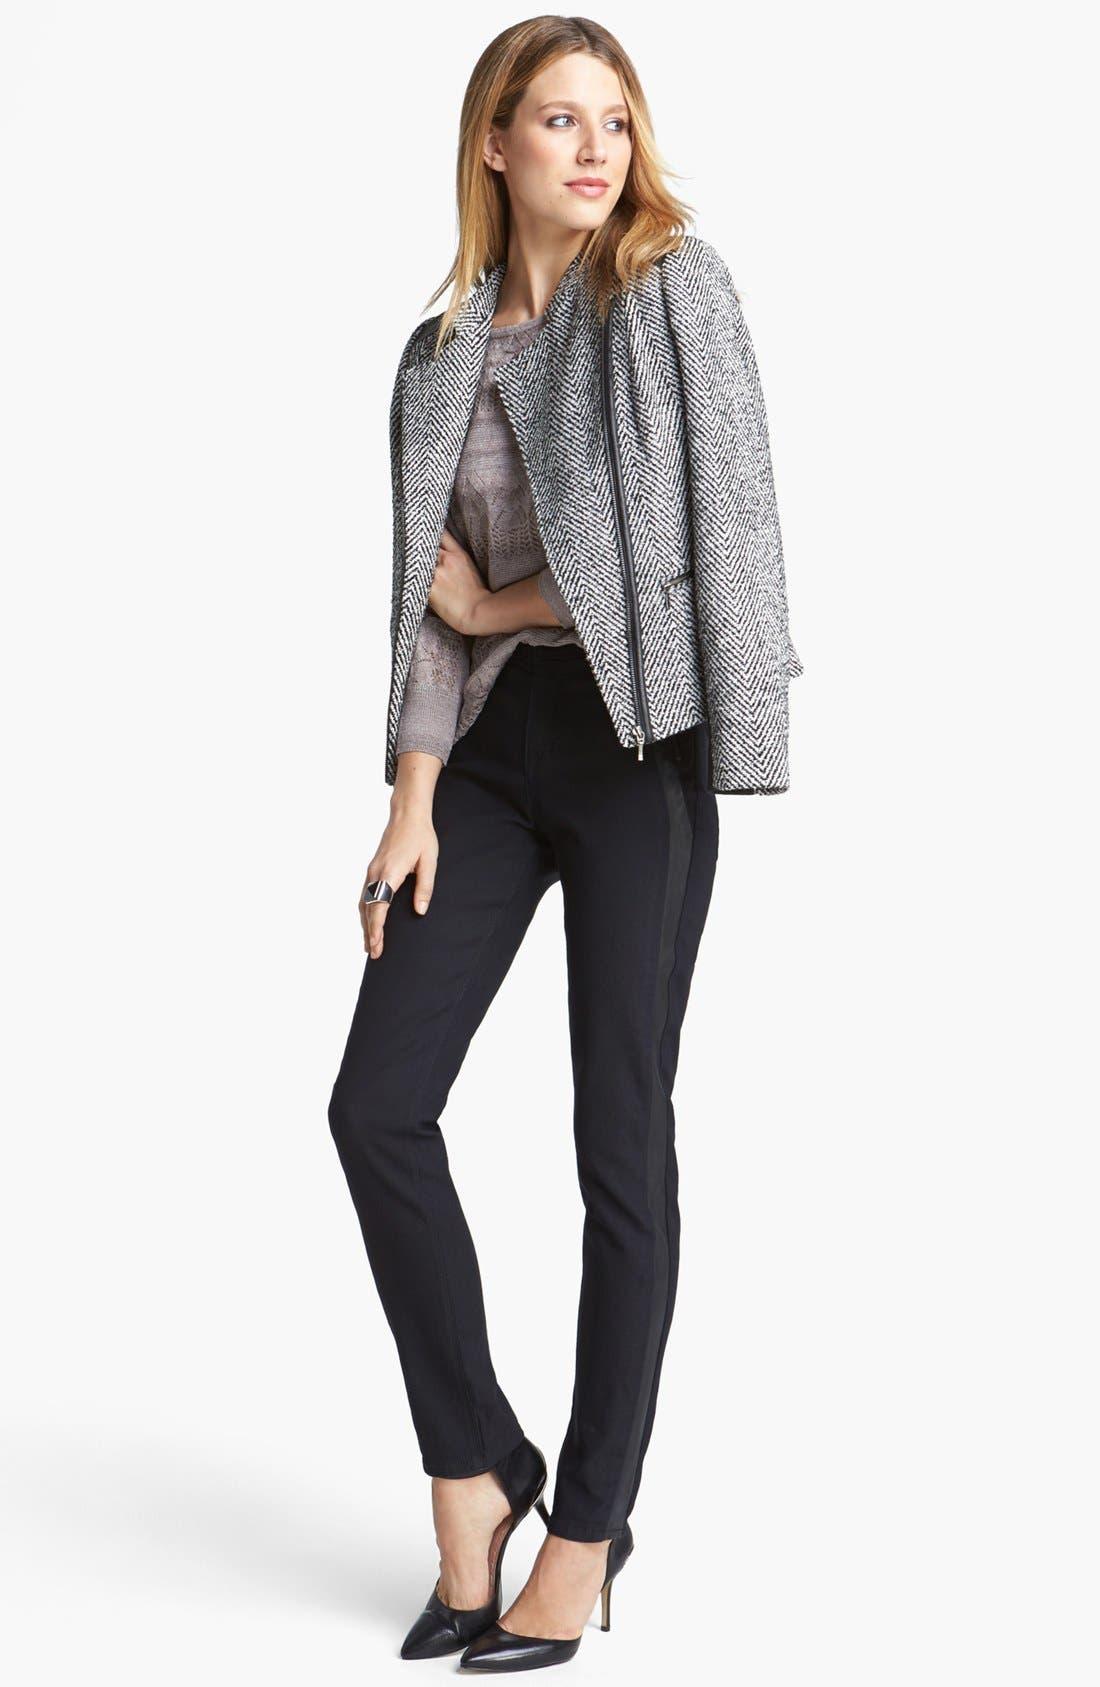 Alternate Image 1 Selected - NYDJ 'Megan' Faux Leather Trim Stretch Skinny Jeans (Dark Enzyme)